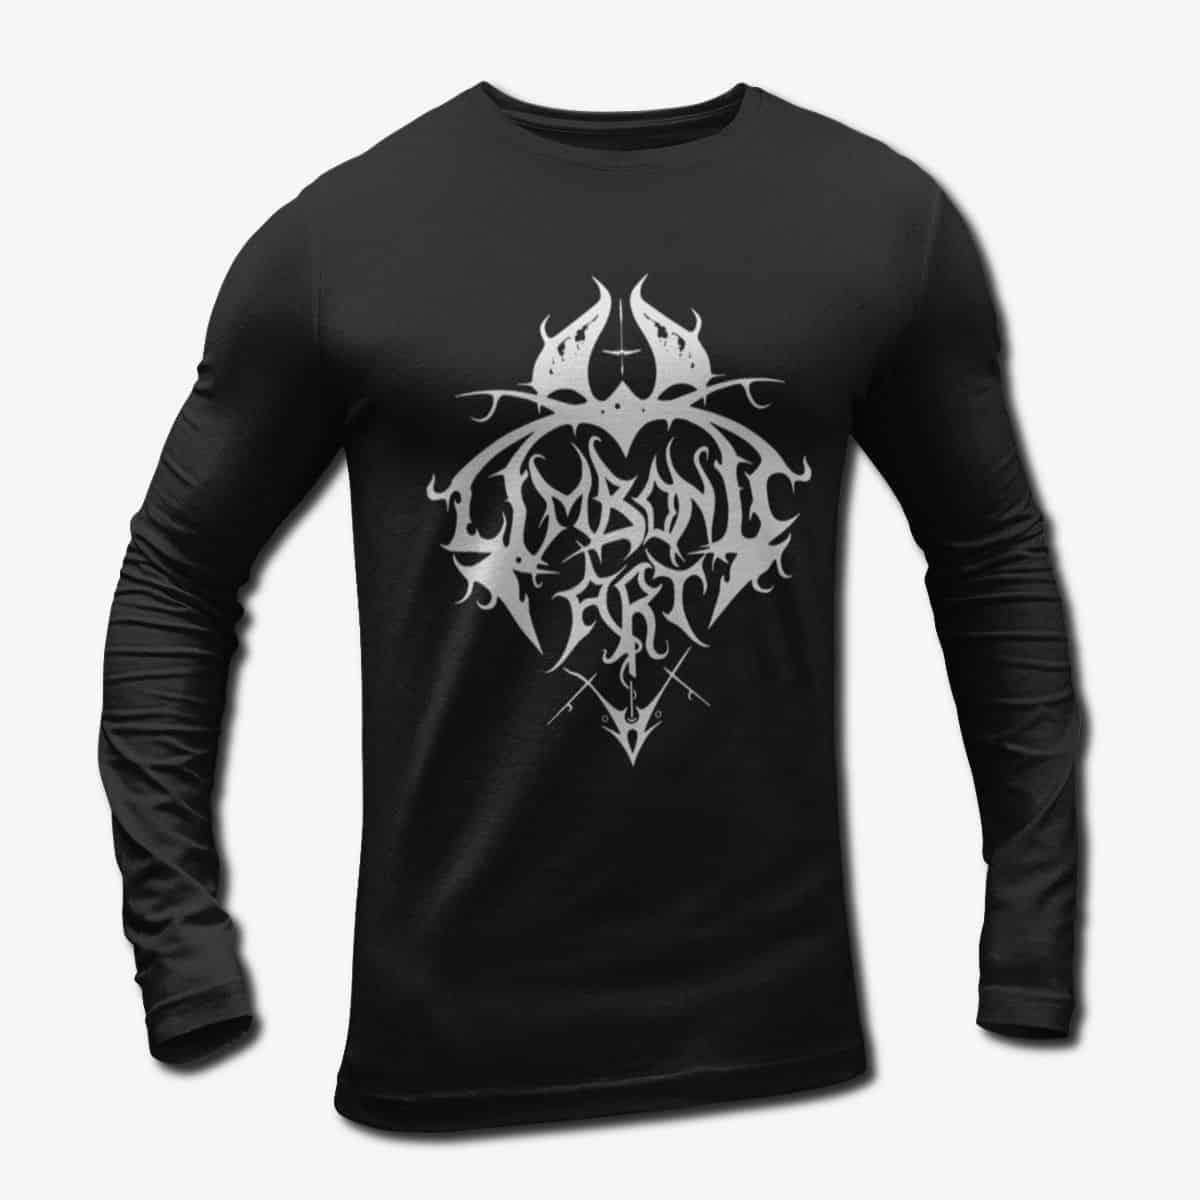 420e130bc696 Limbonic Art Band Long Sleeve T-Shirt, Limbonic Art Logo Longsleeve ...